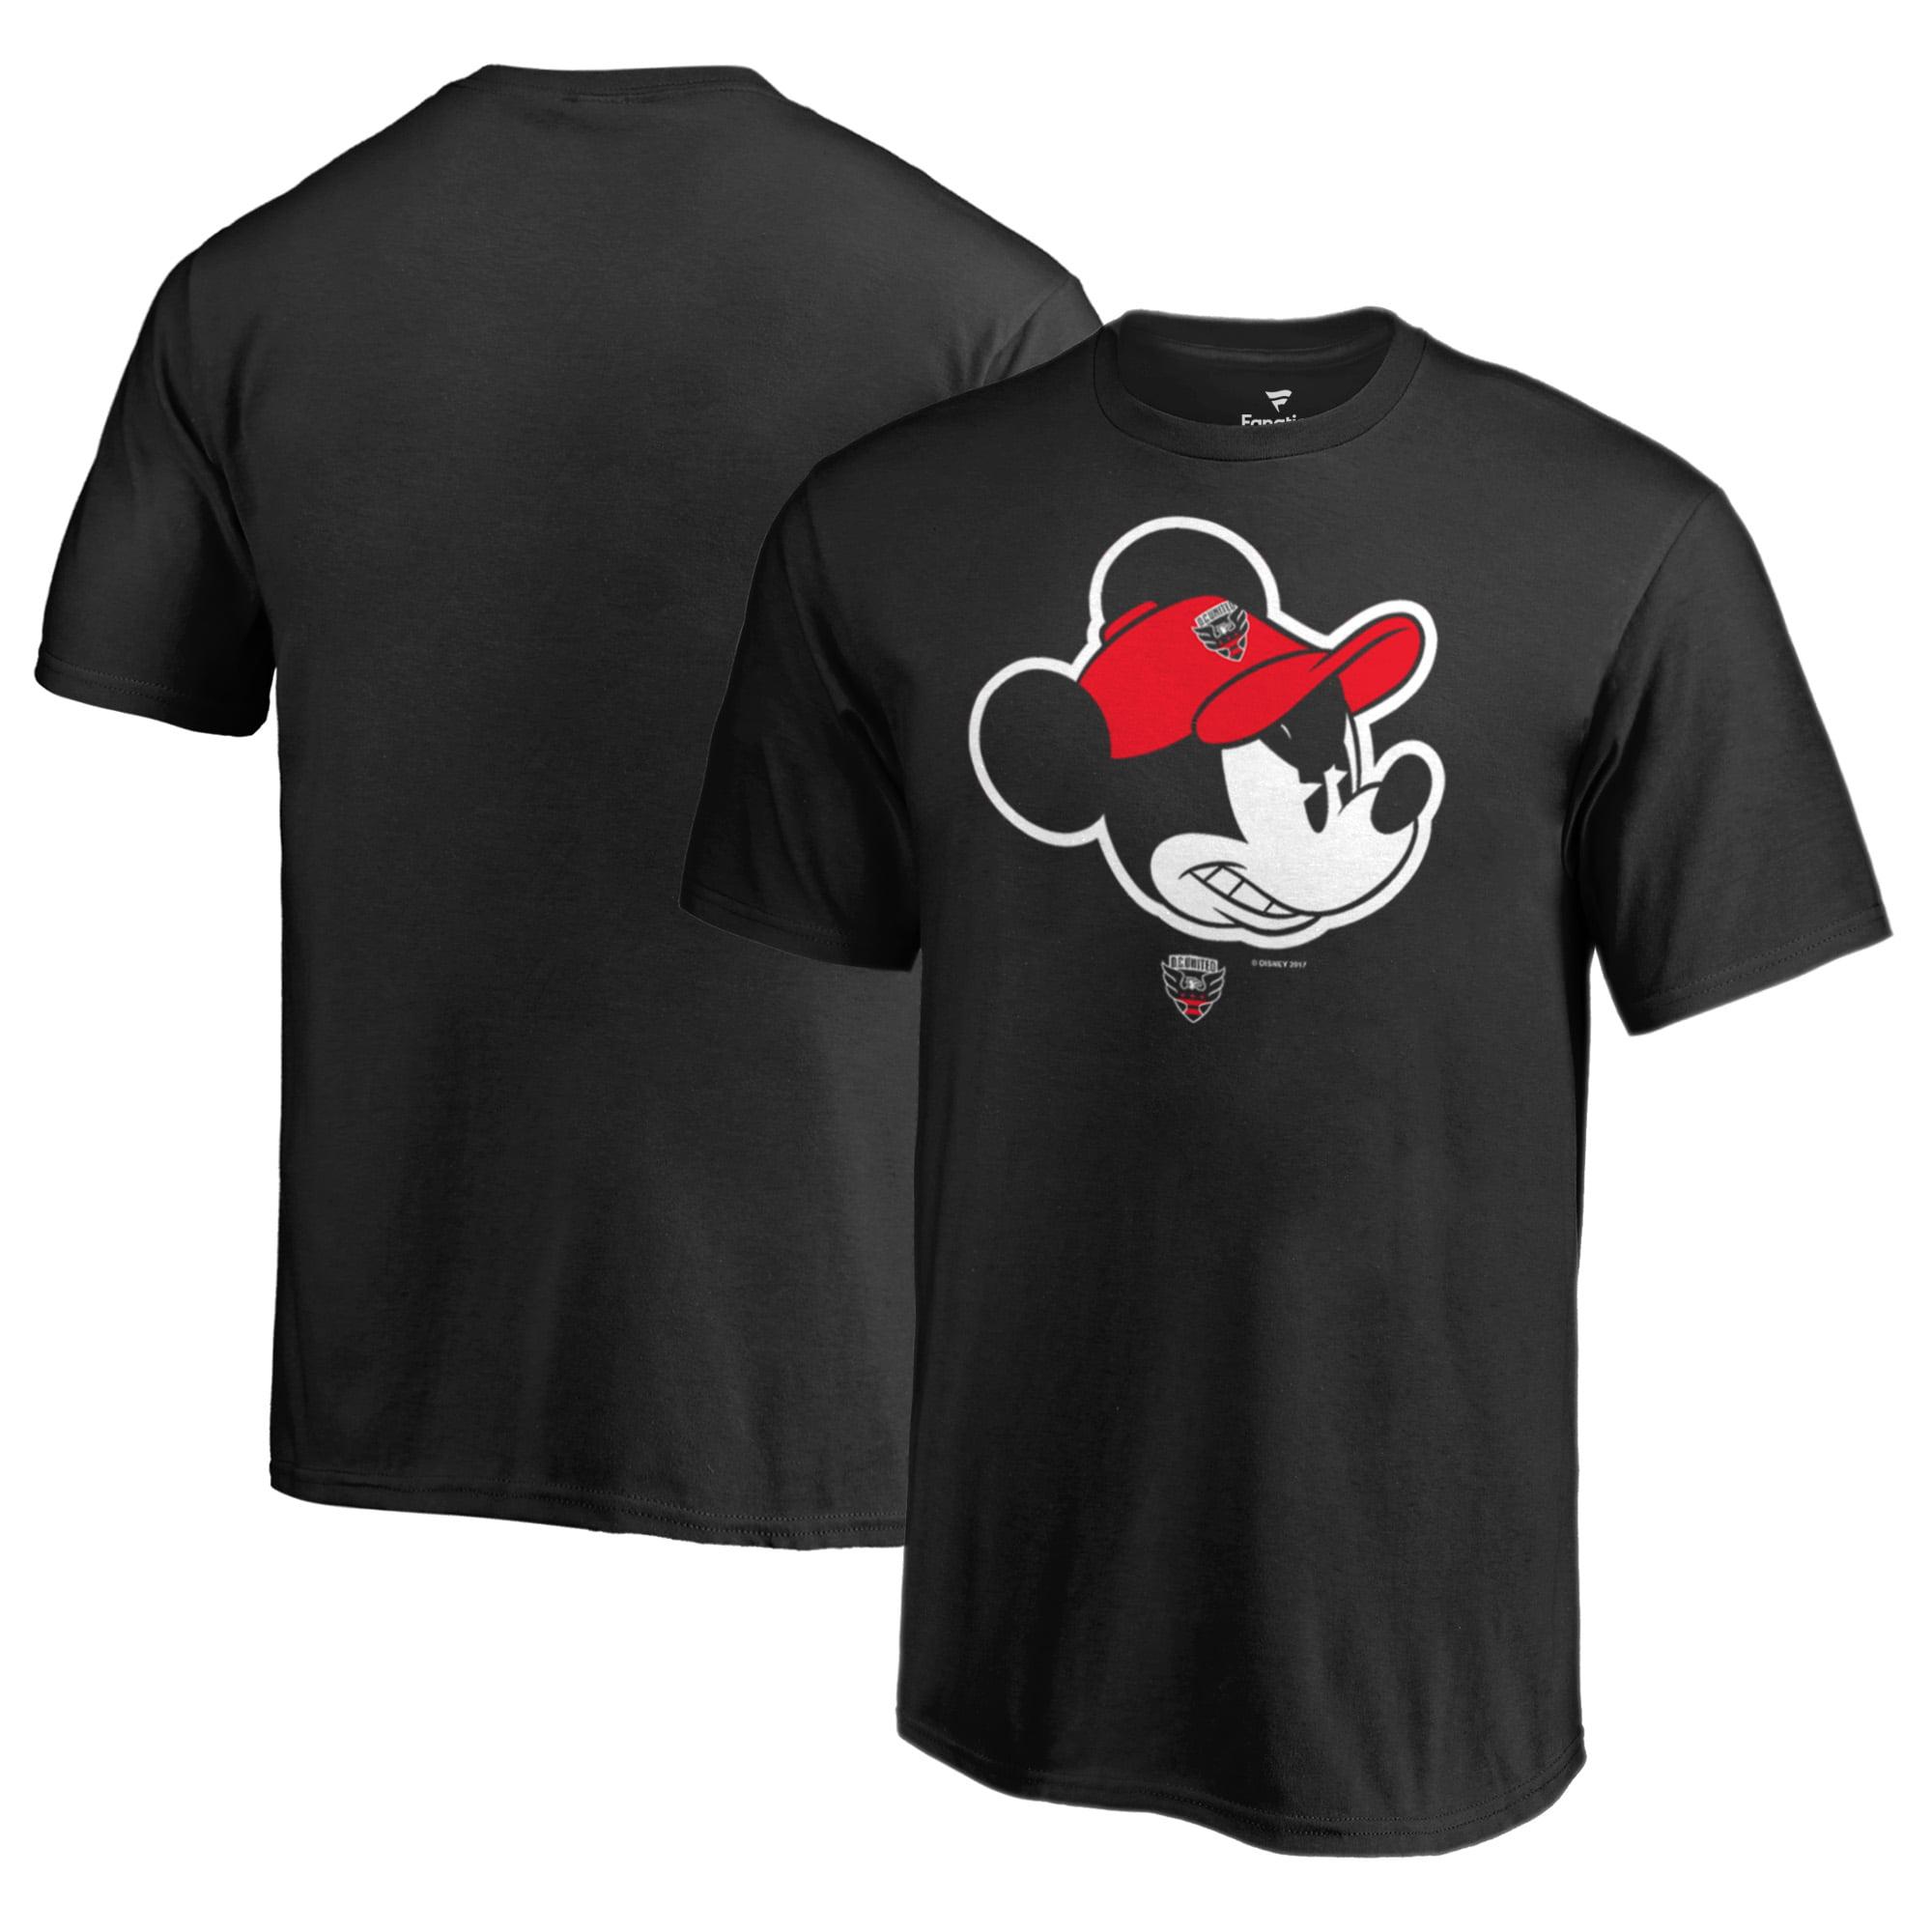 D.C. United Fanatics Branded Youth Disney Game Face T-Shirt - Black